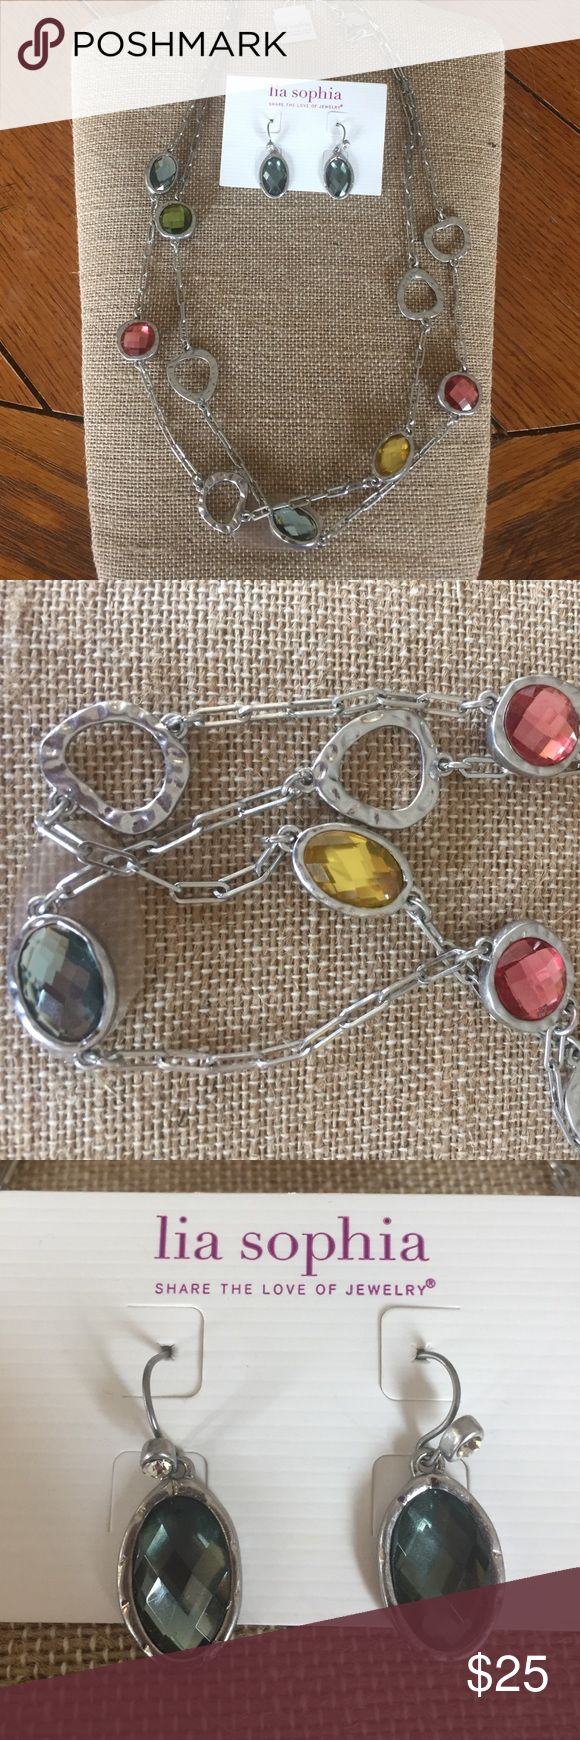 "NWT Lia Sophia necklace and earrings Beautiful NWT Lia Sophia necklace and earring set. Chain is 42"" long. Lia Sophia Jewelry"